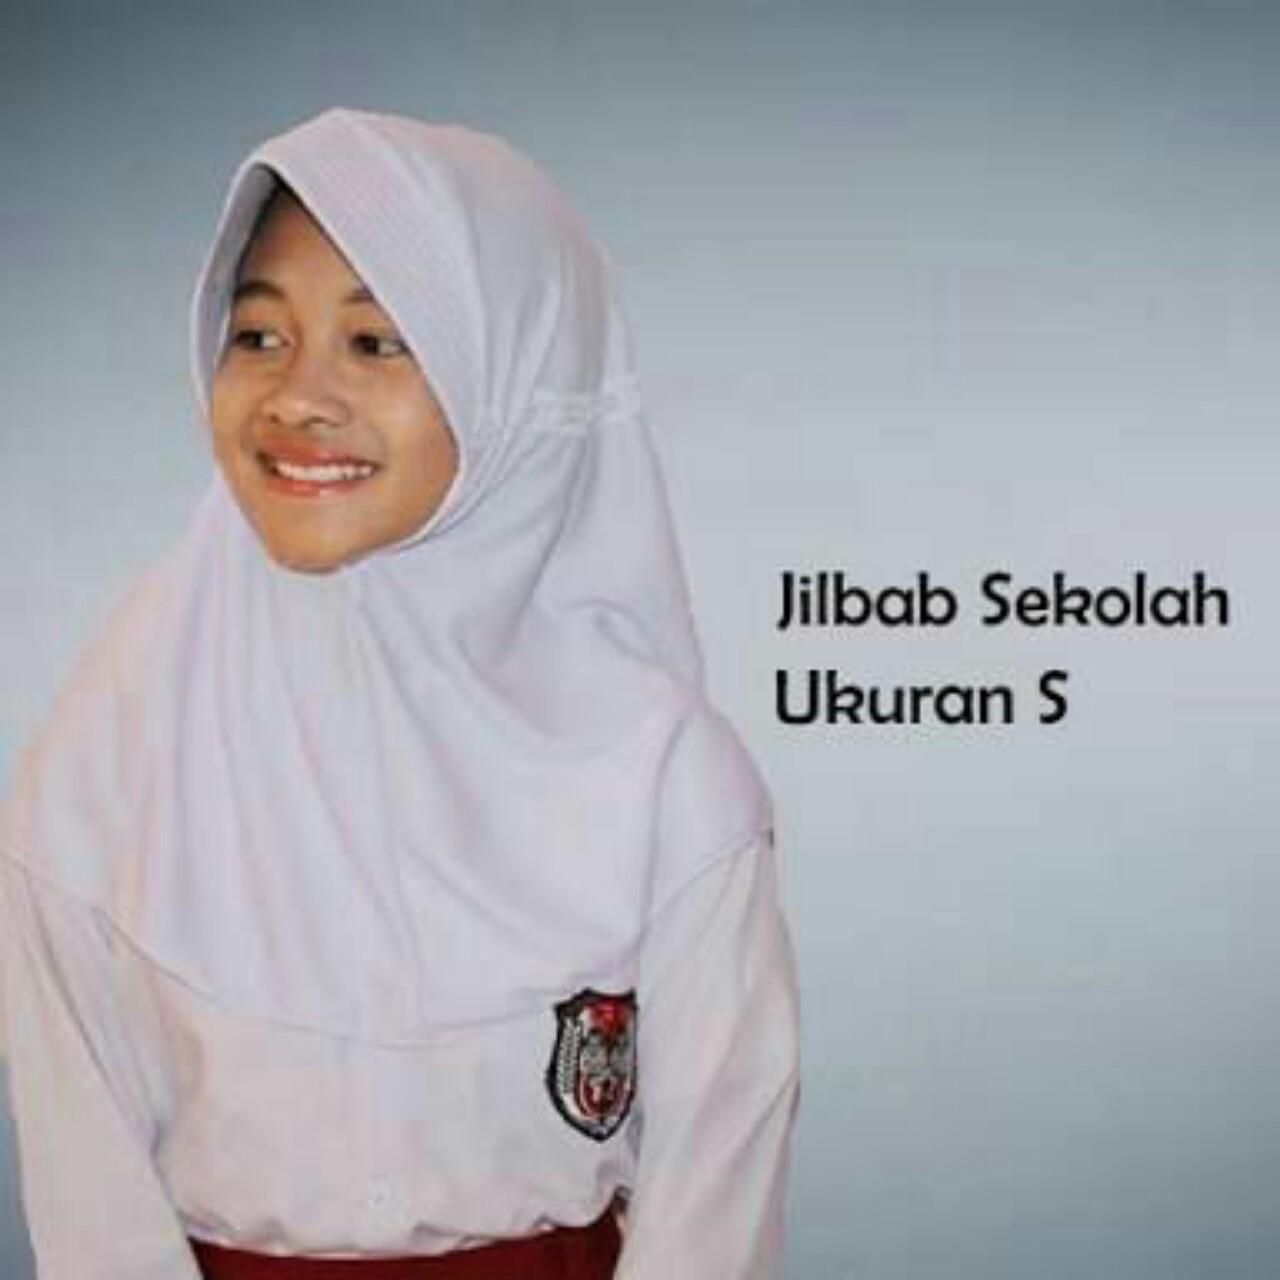 Jilbab instant anak sekolah ukuran S